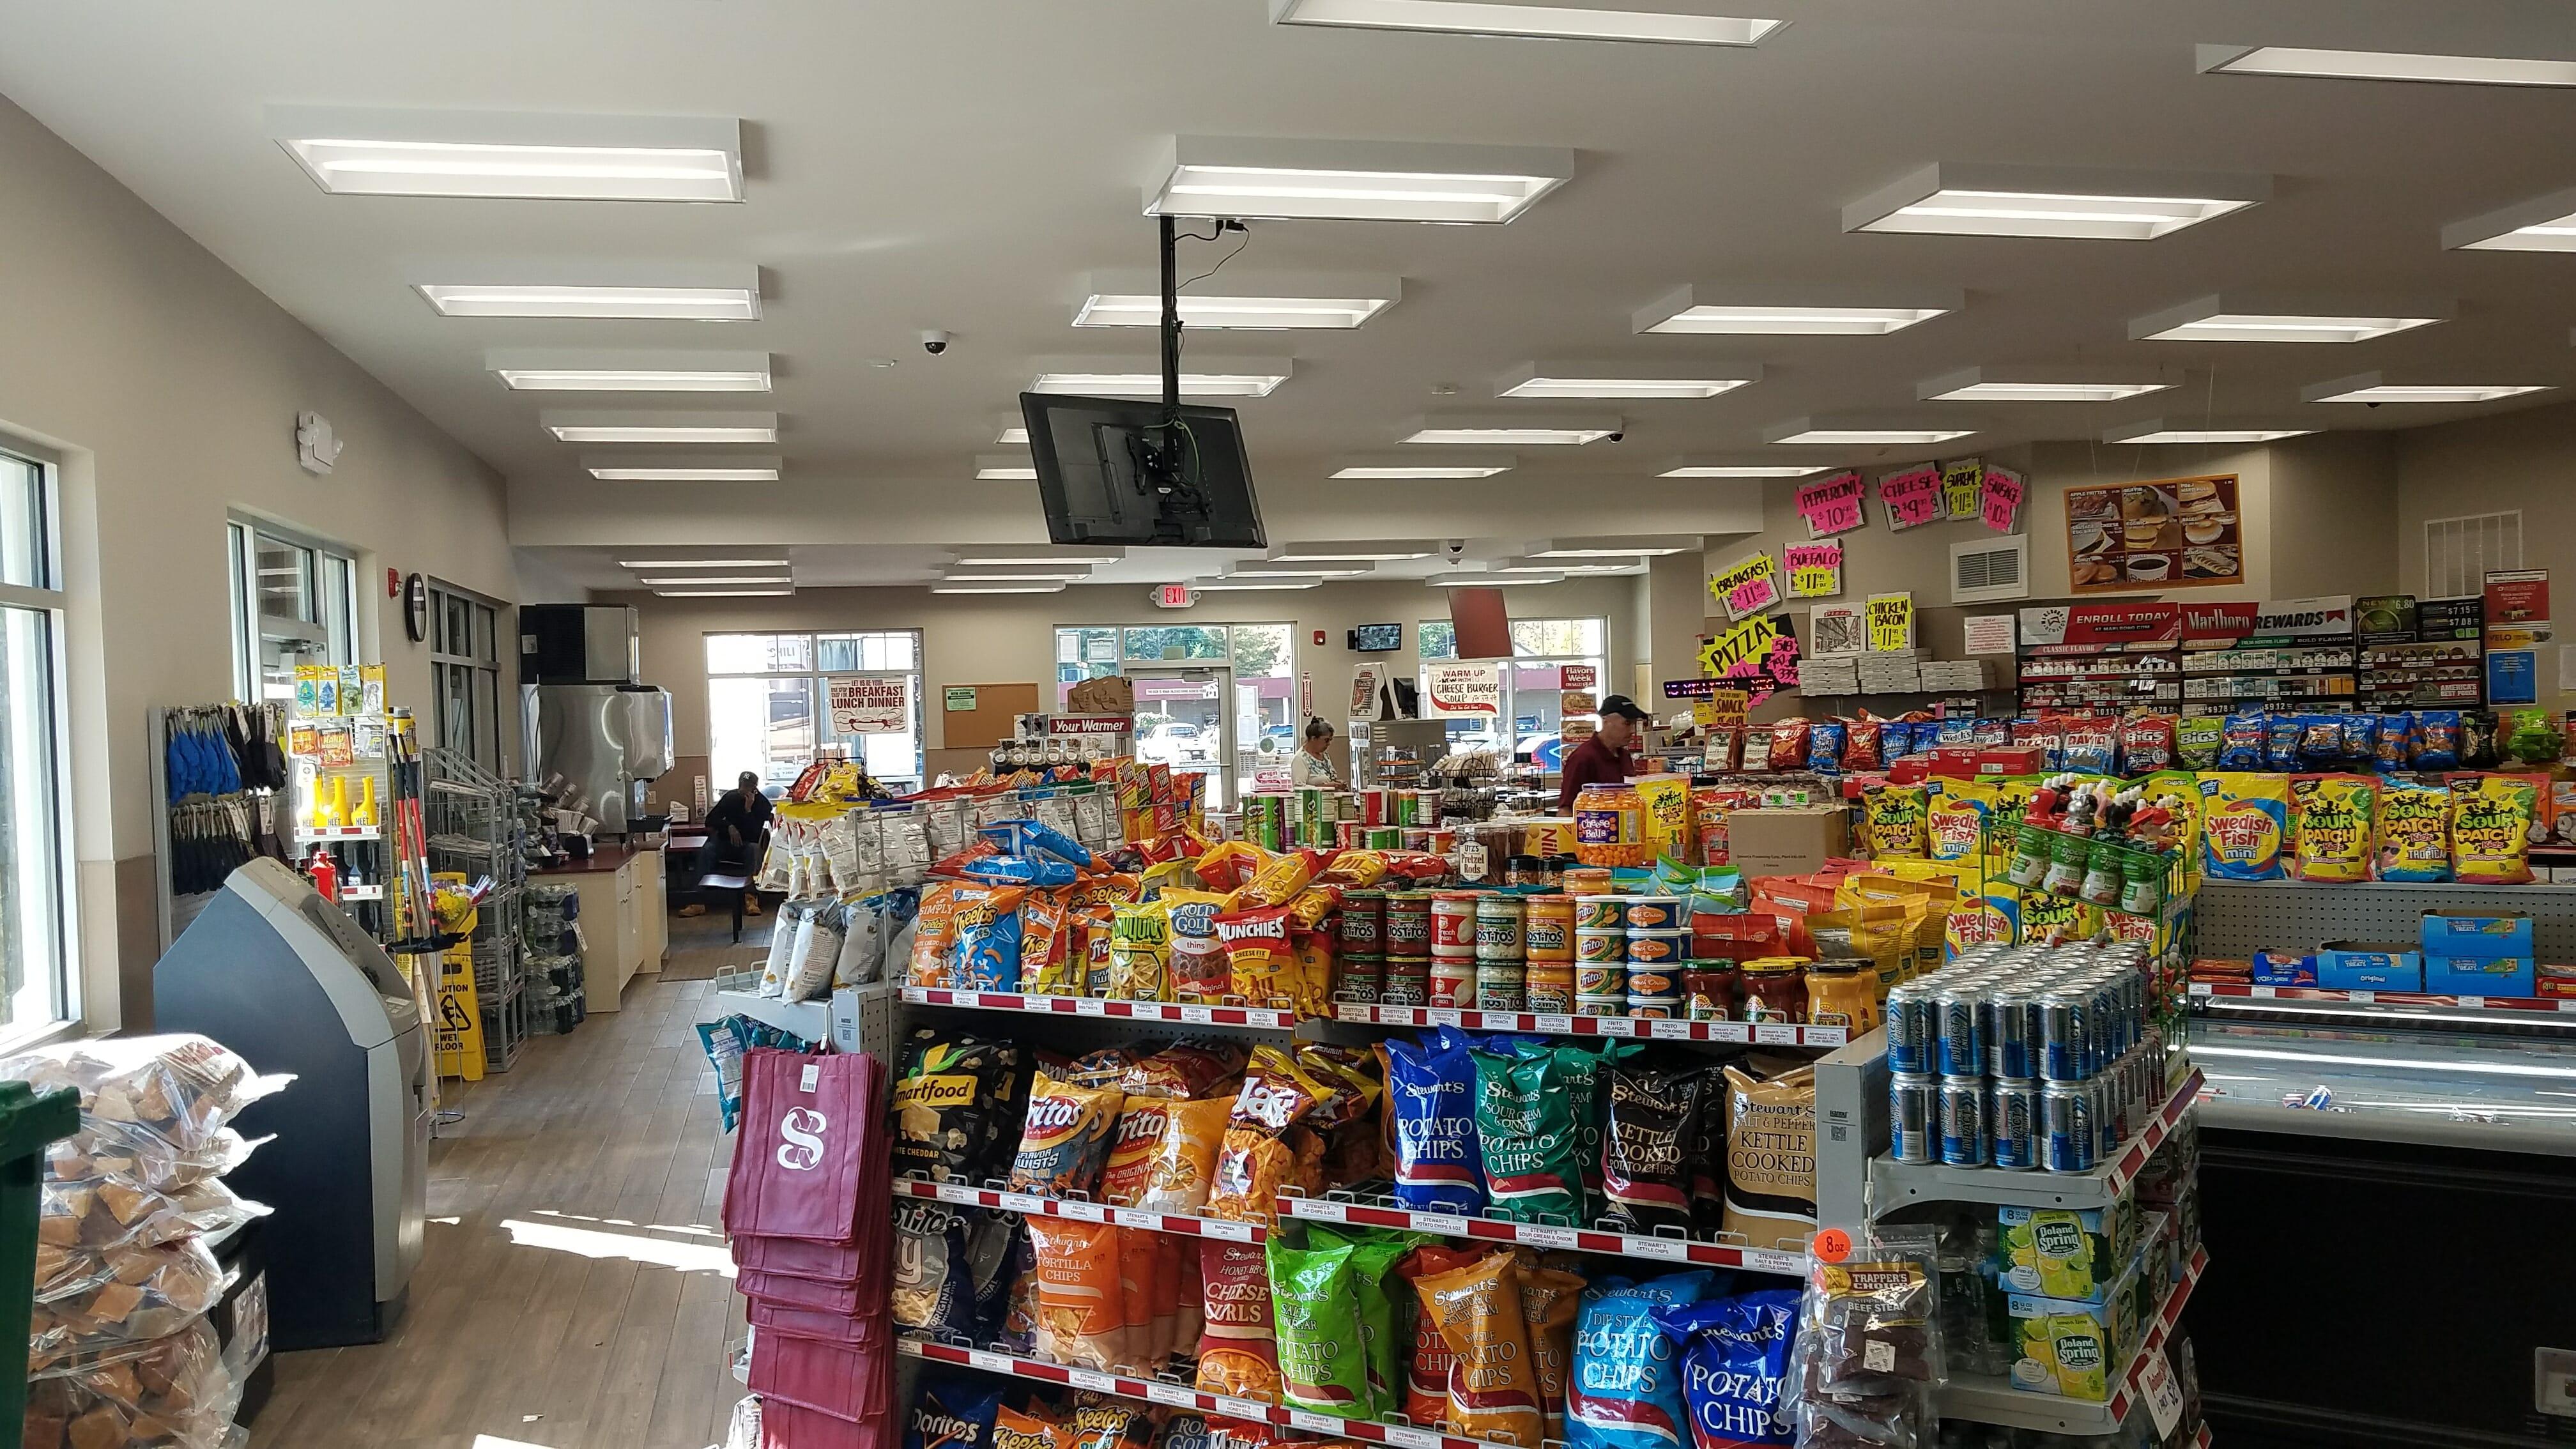 interior of shop snack isle